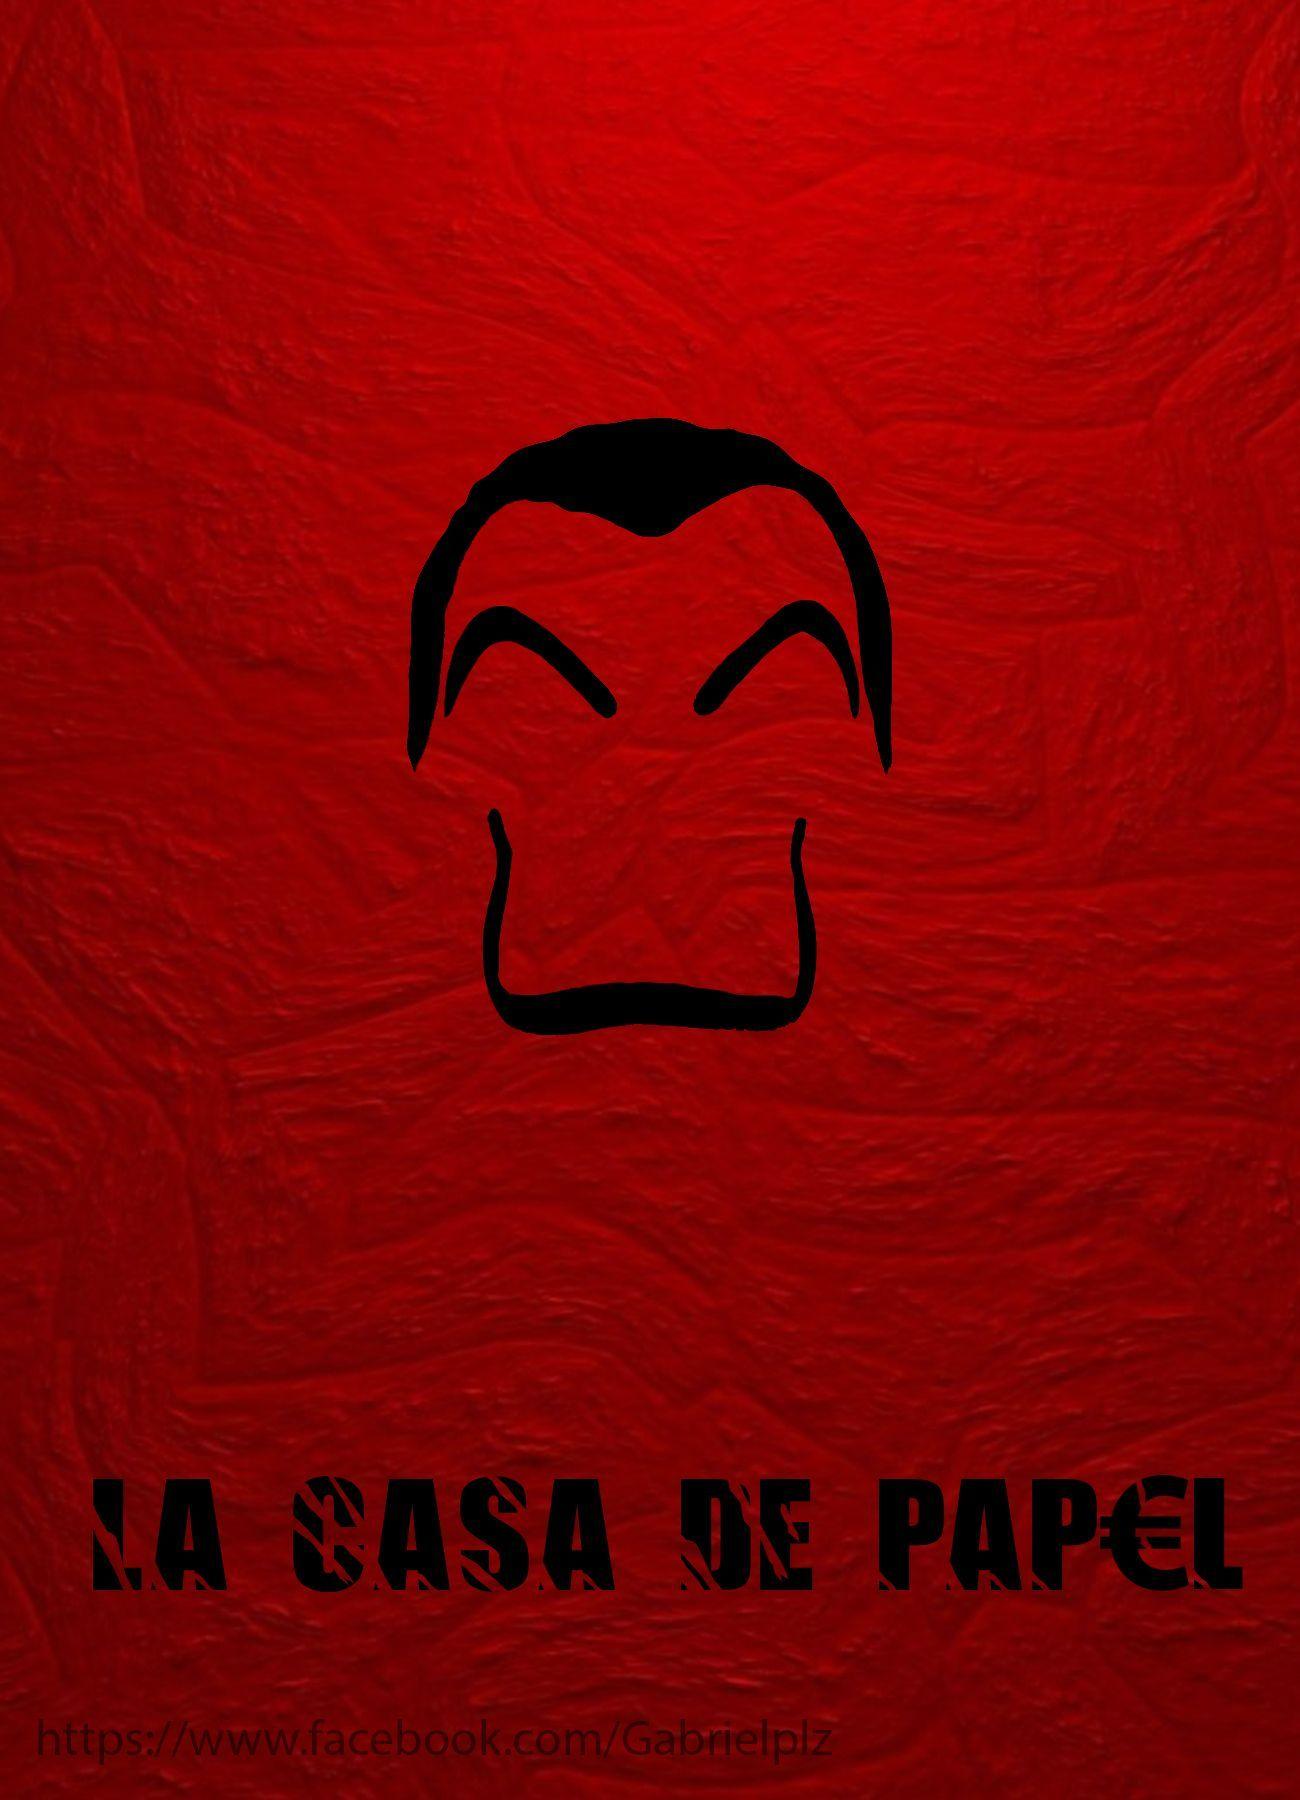 9 La Casa De Papel Wallpaper Iphone Desktop And Android Best Shows On Netflix Iphone Wallpaper Wallpaper